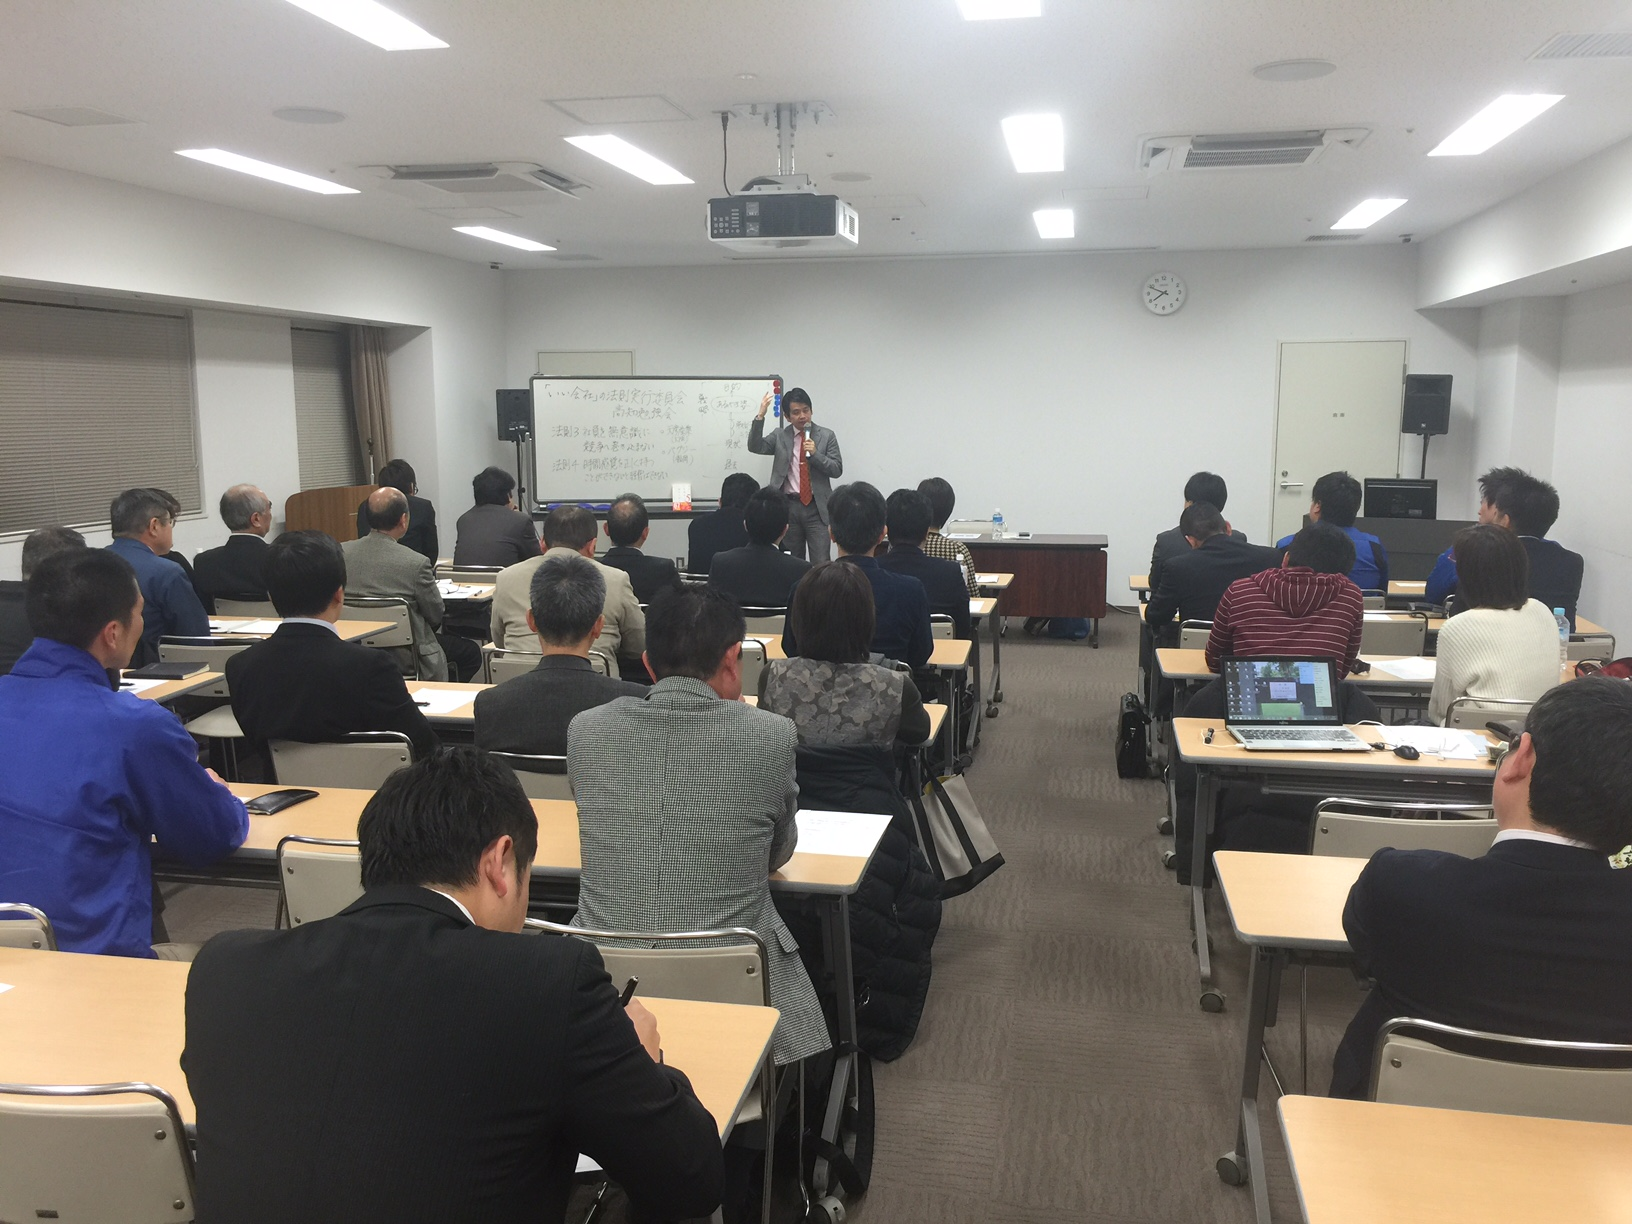 IMG 7014 - 3月14日第3回になります「いい会社」高知勉強会開催しました。